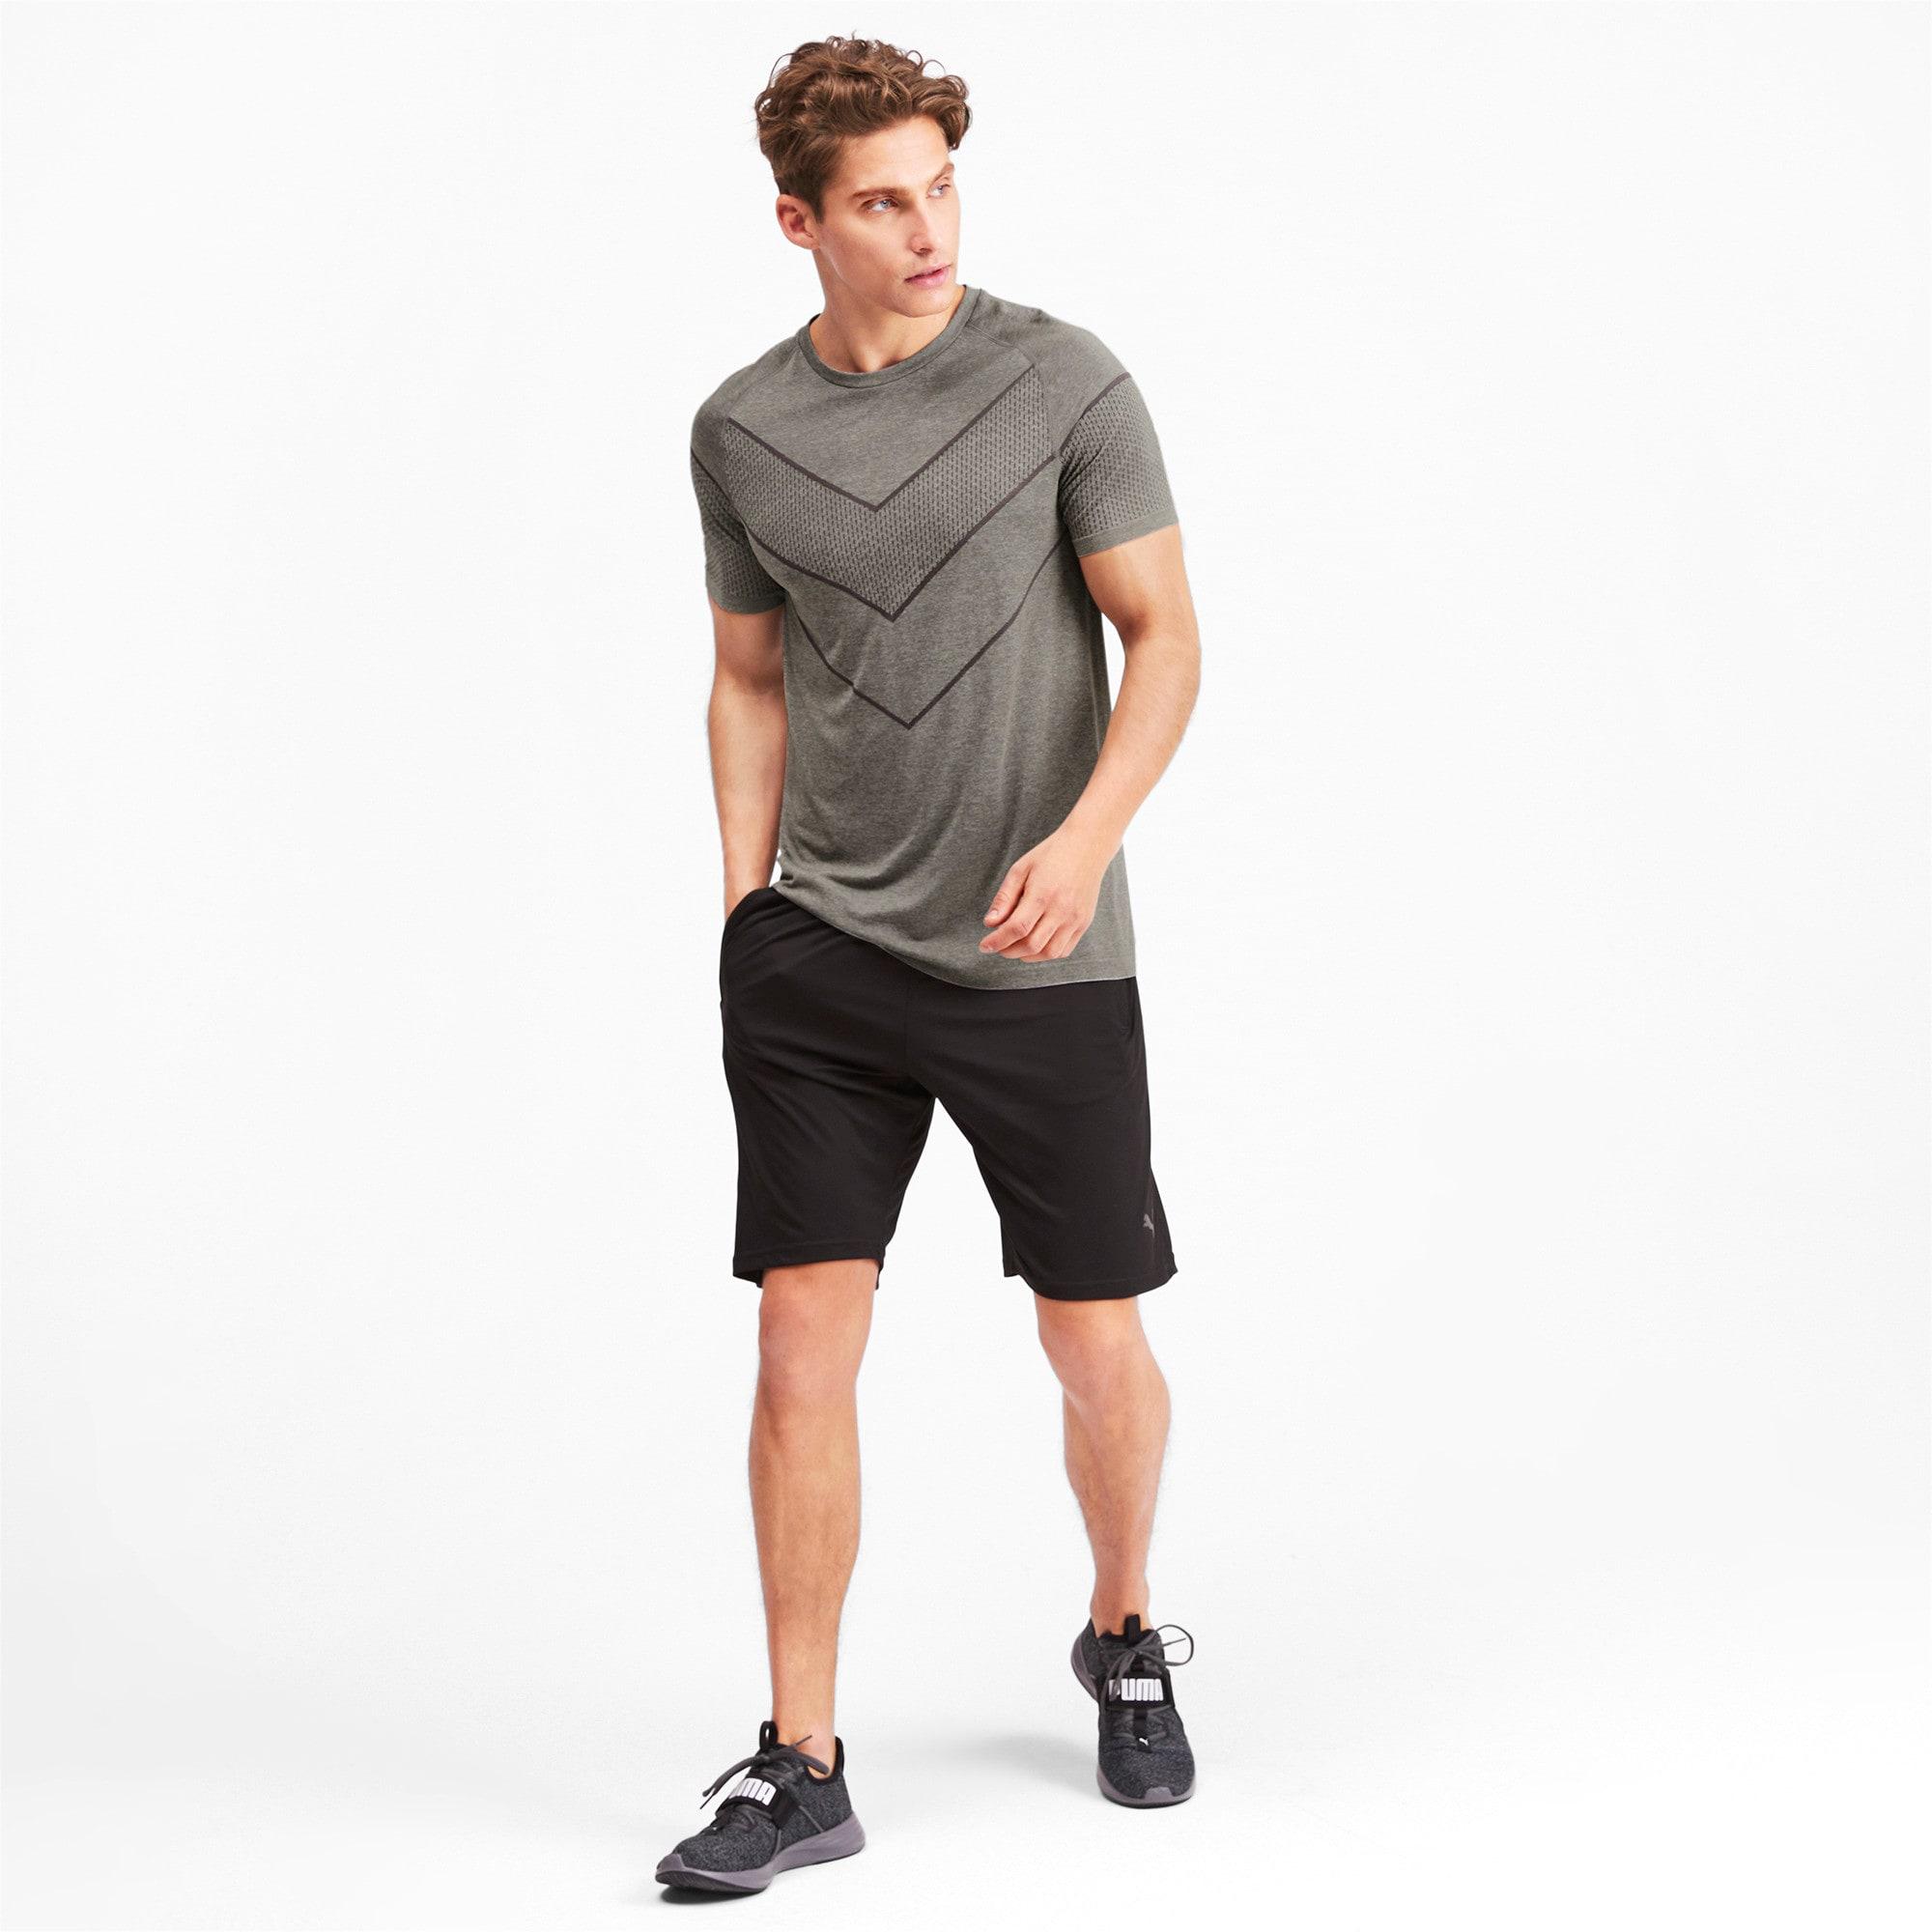 Thumbnail 3 of T-Shirt Reactive evoKNIT pour homme, Medium Gray Heather, medium